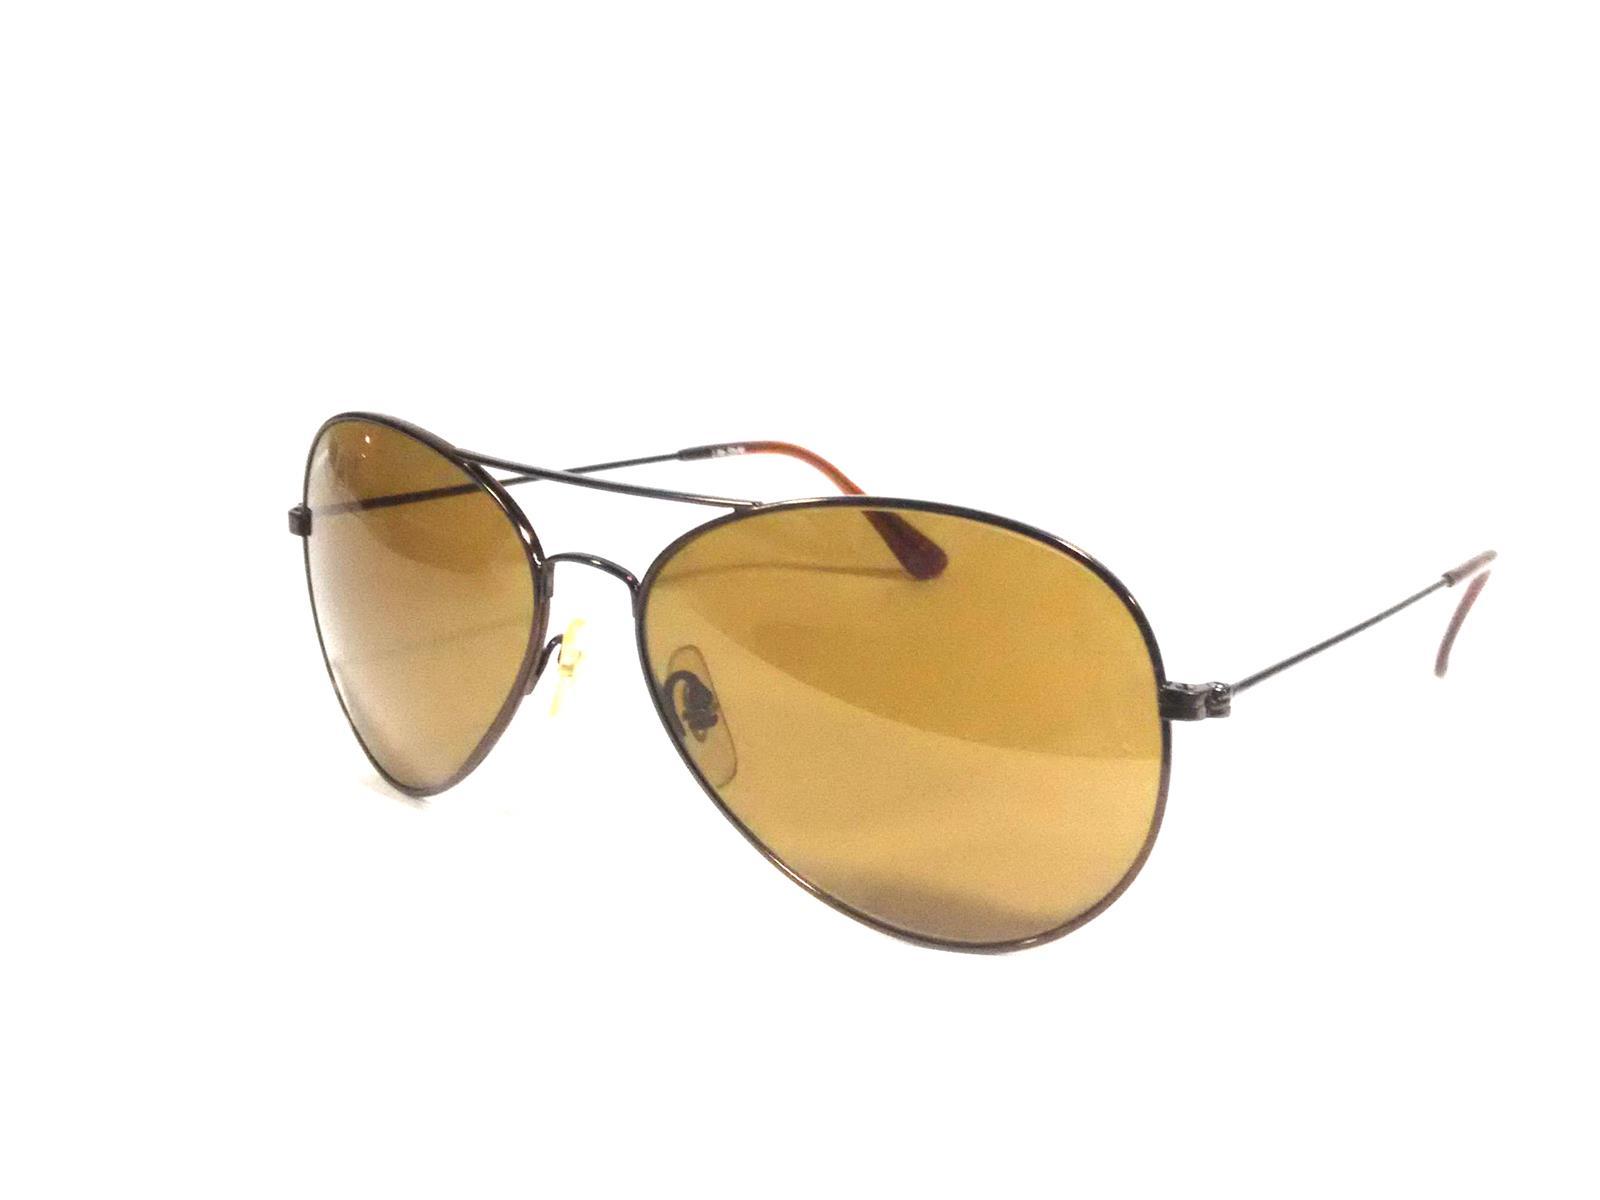 Brown Aviator Sunglasses for men and women capbr